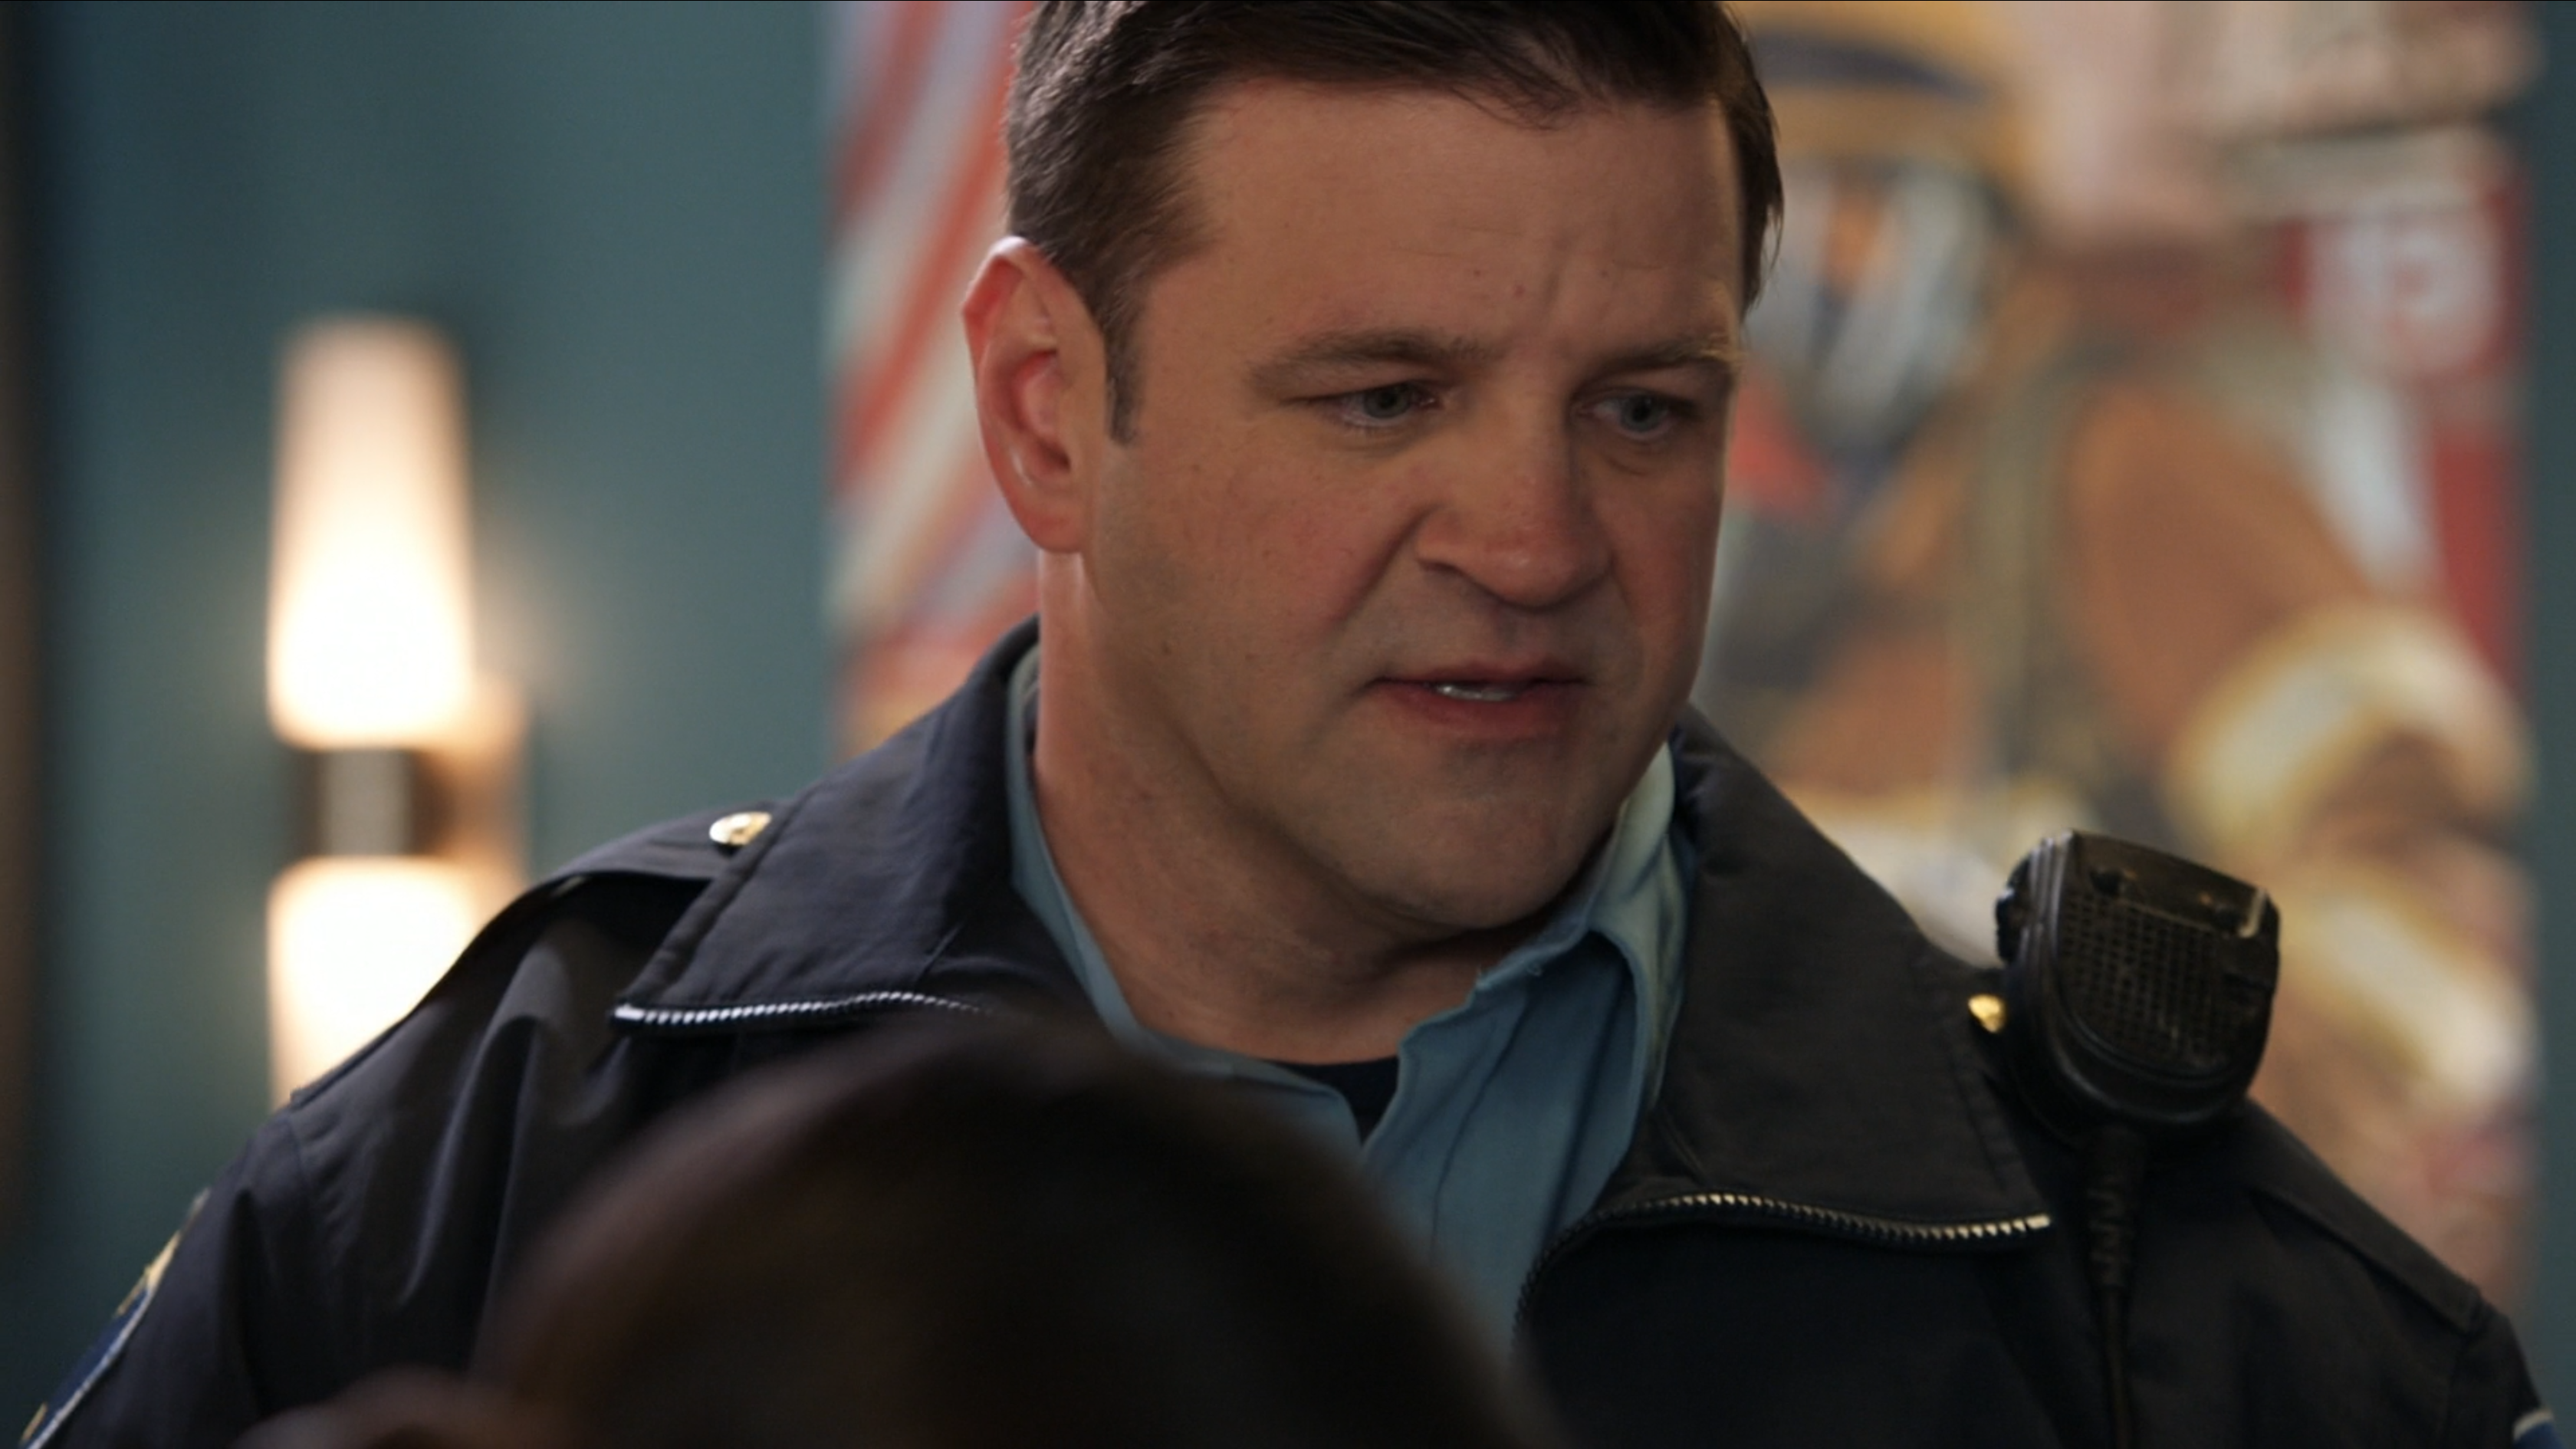 Officer Reaser